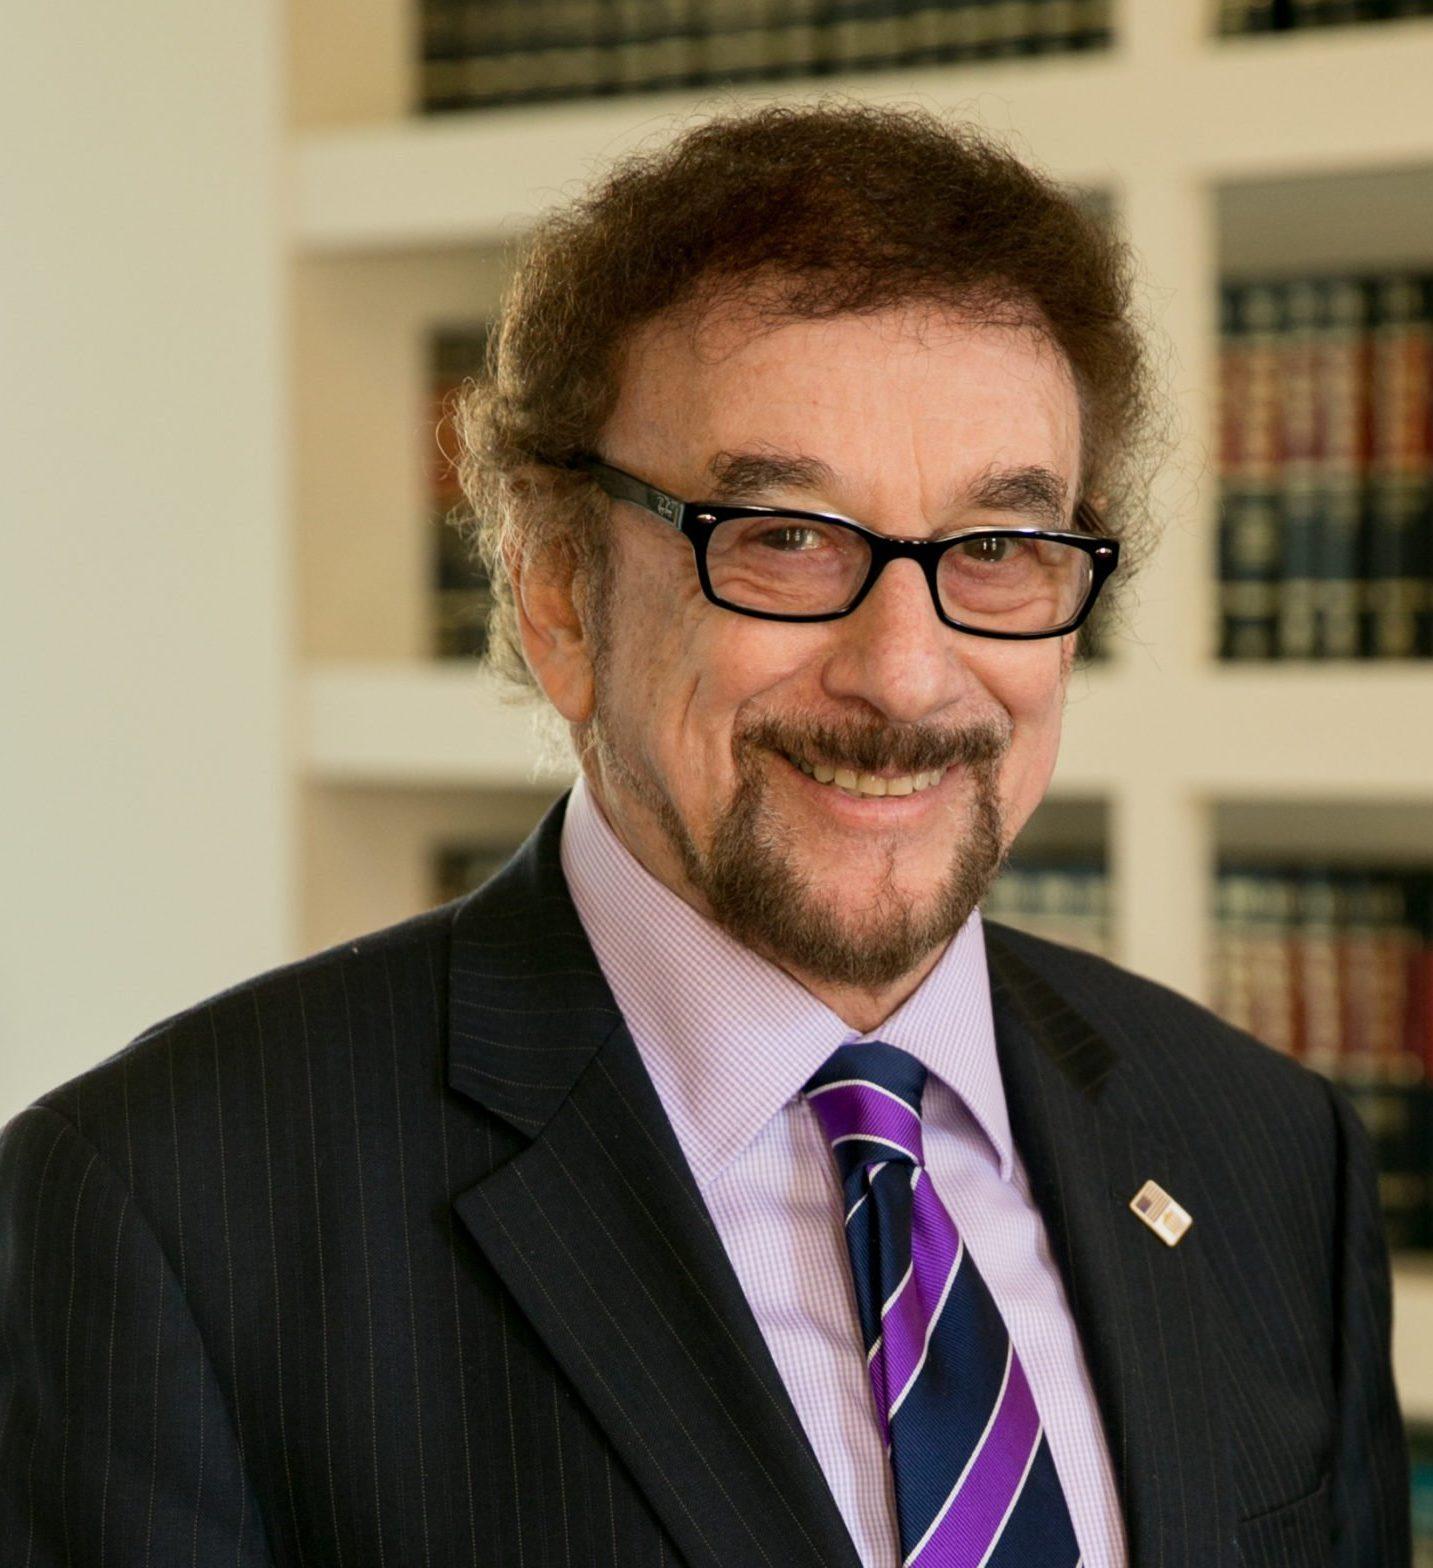 Image of Martin Minkowitz, Treasurer